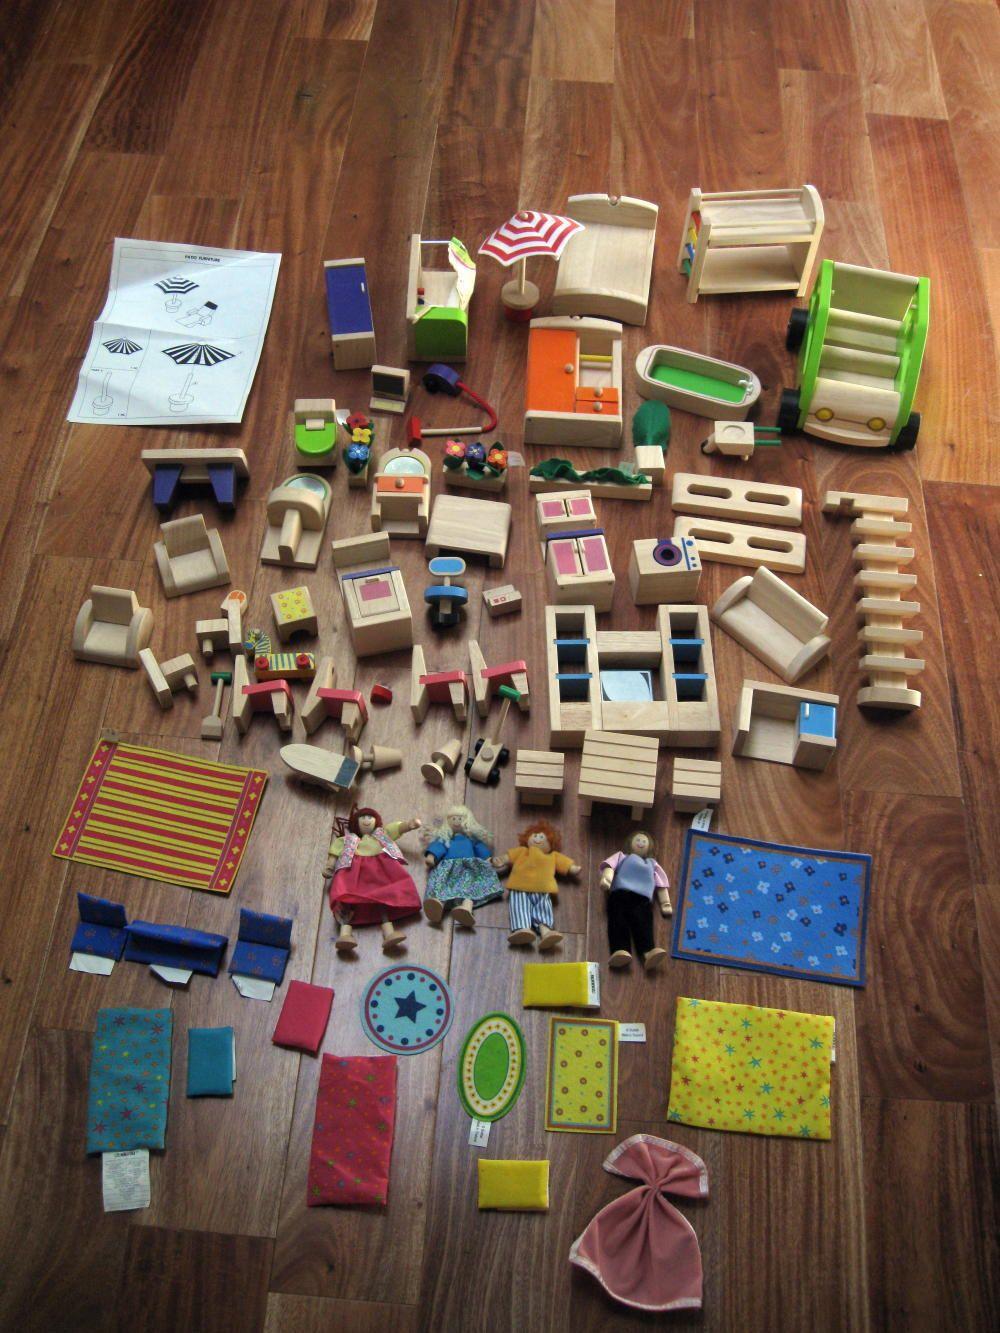 Mint Huge Lot 70 Battat Wooden Dollhouse Furniture Accessories